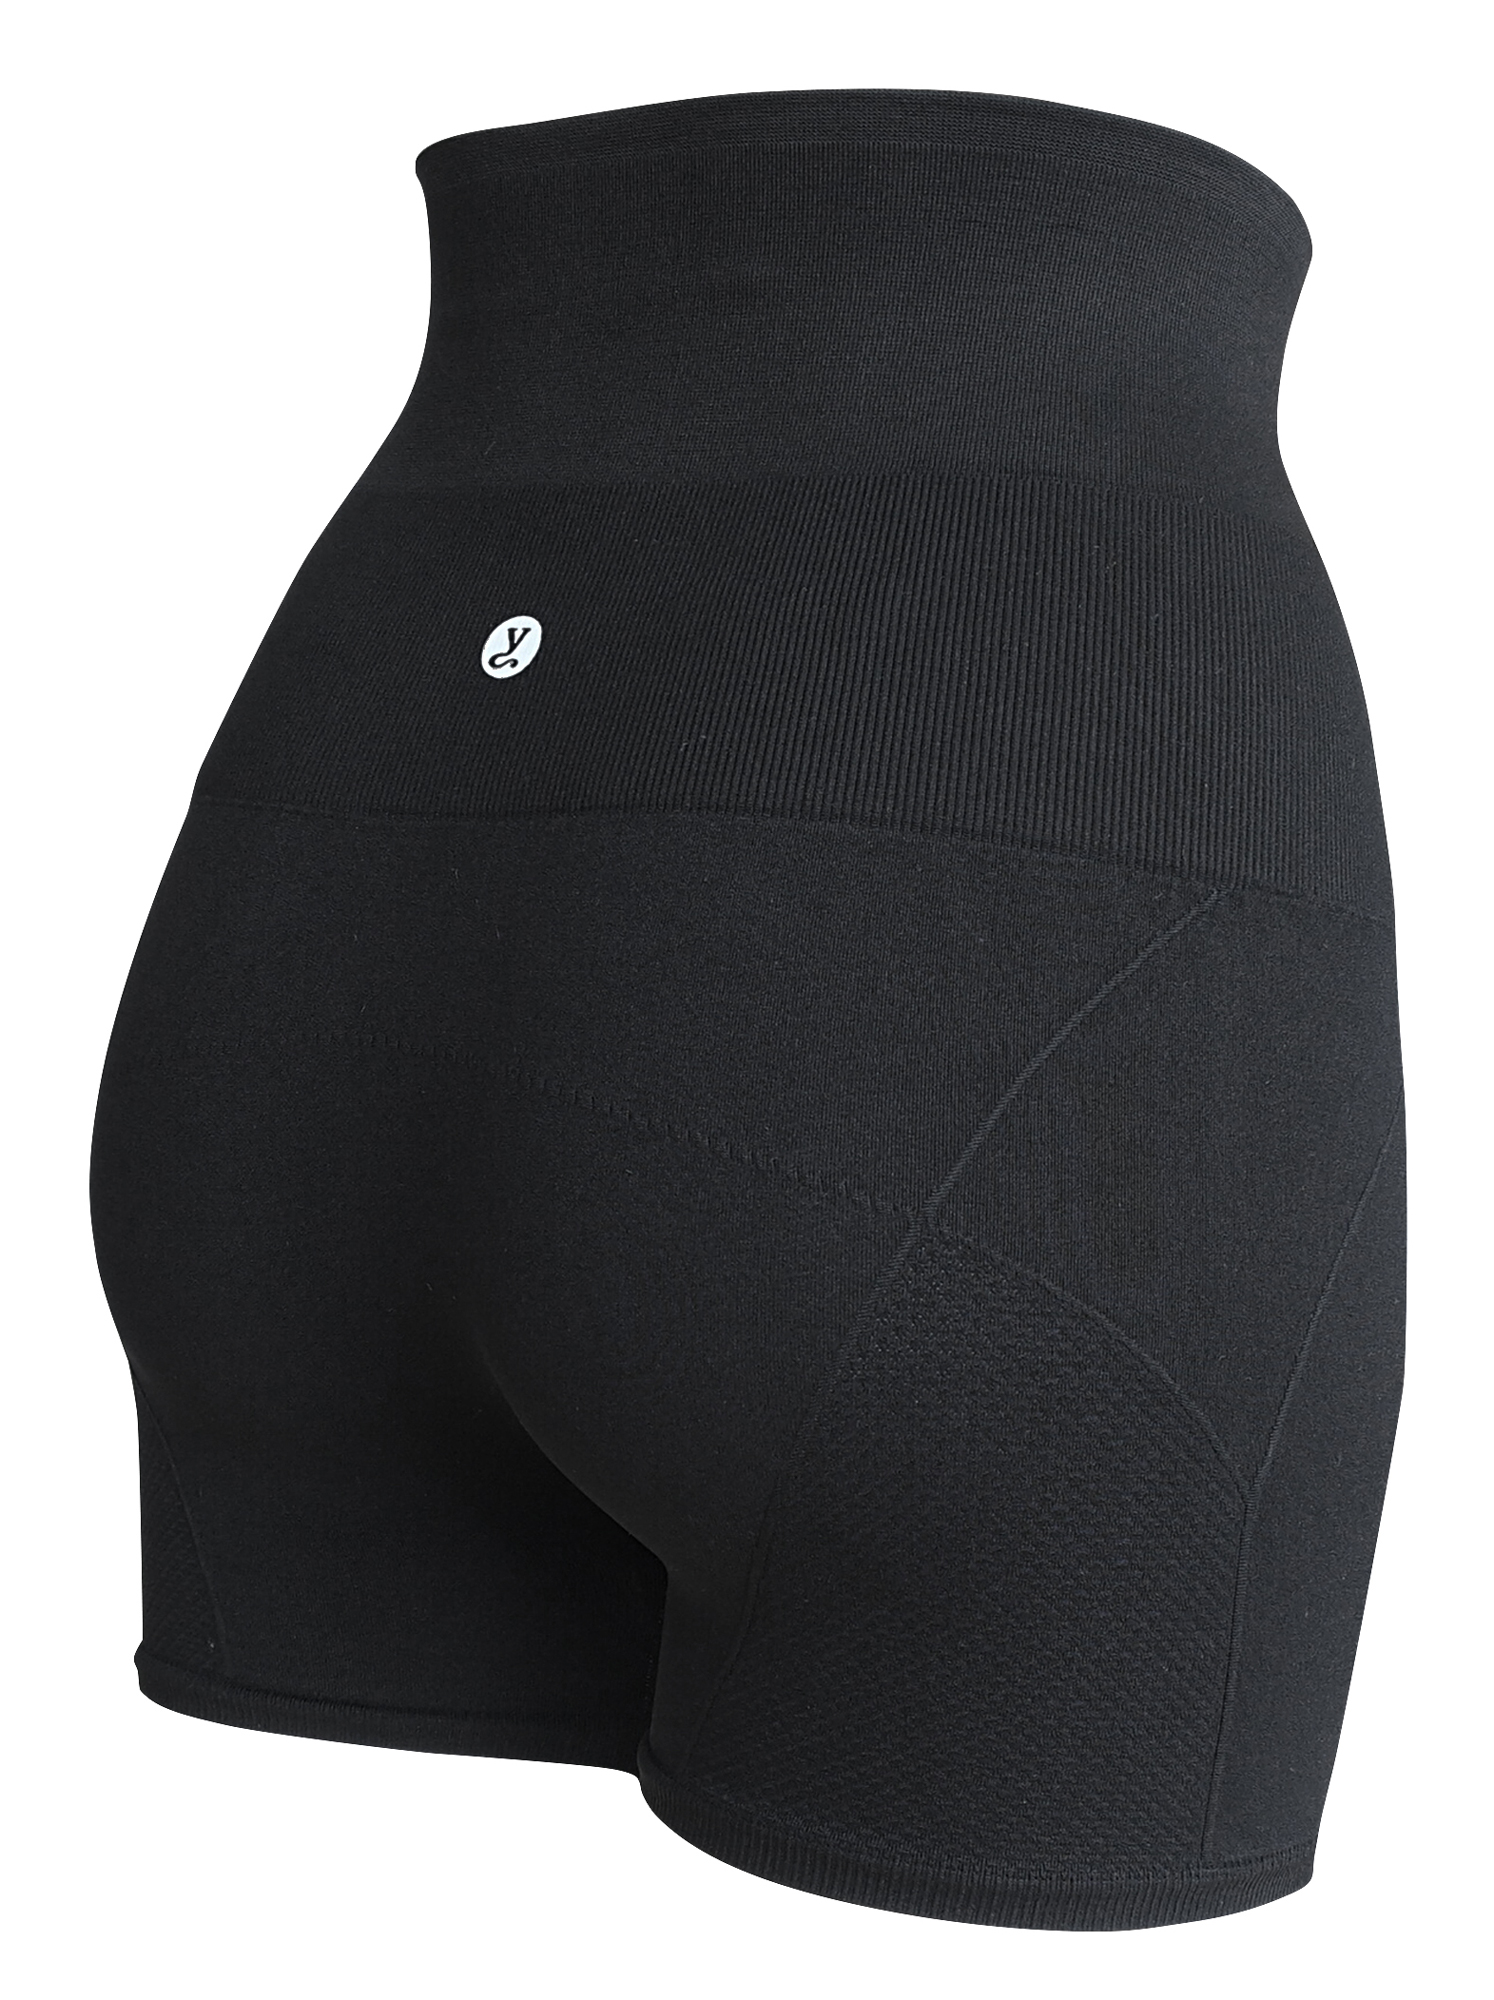 Yoga-shorty - black